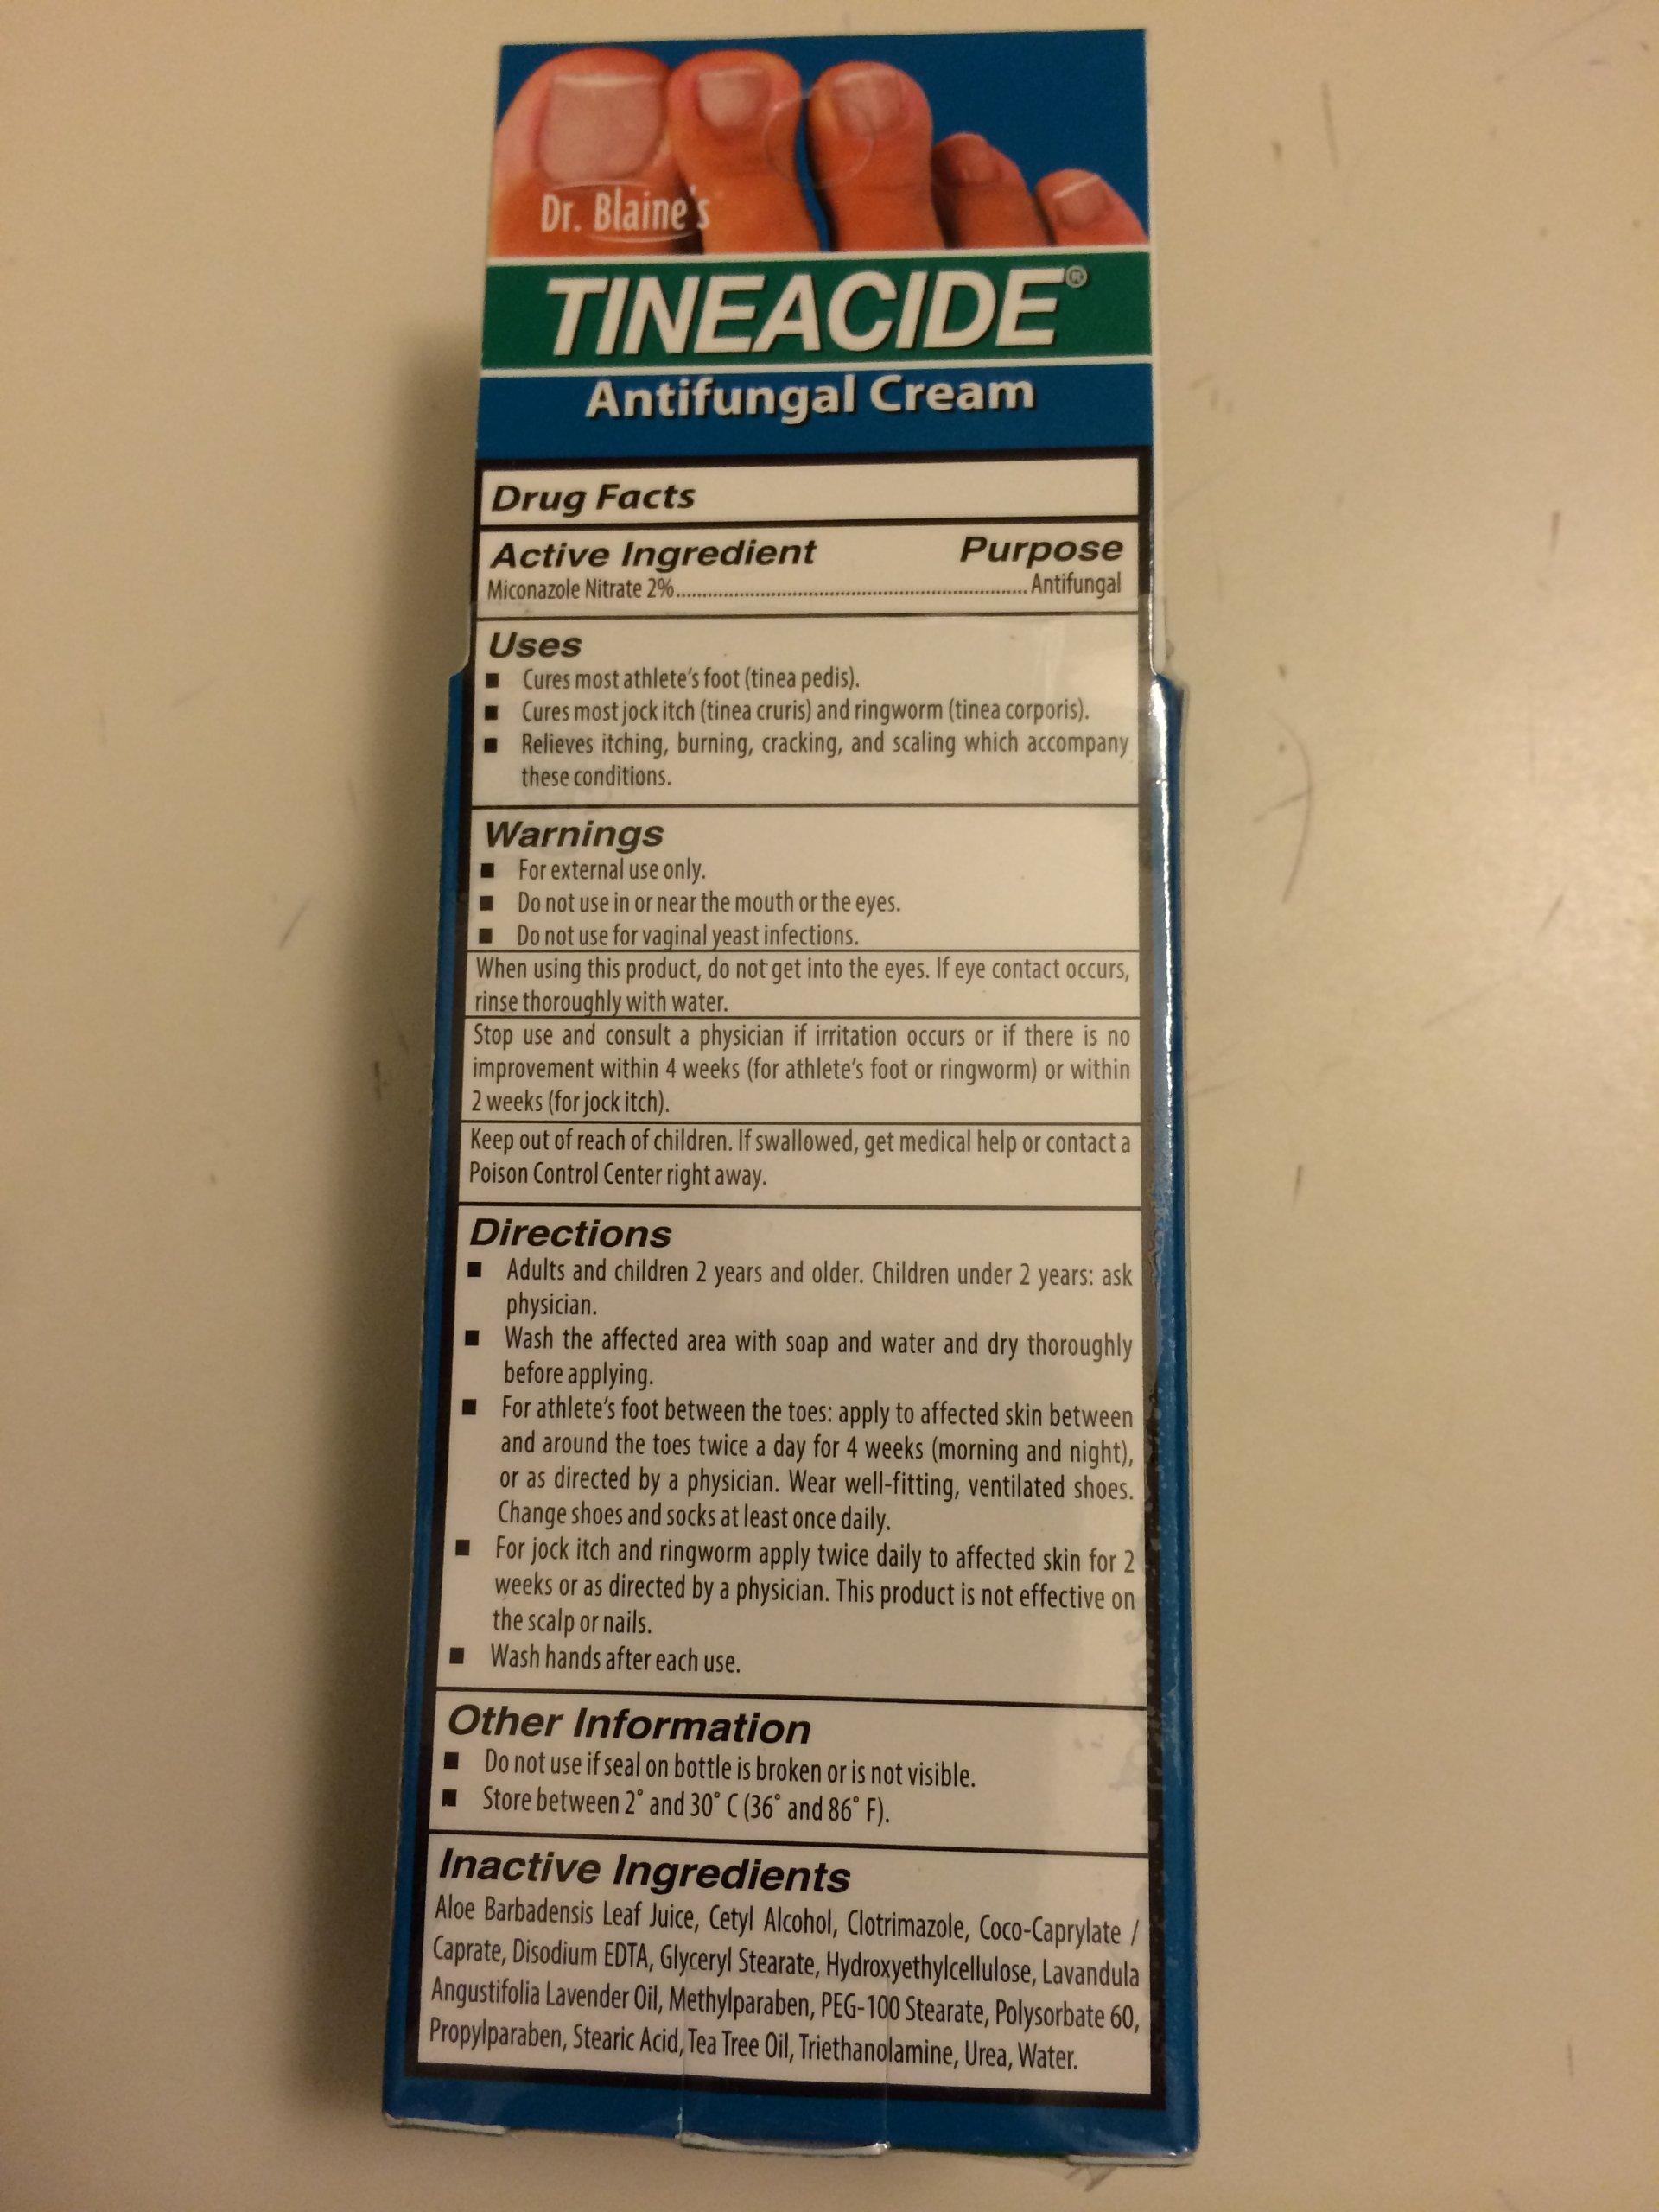 Dr. Blaine's Tineacide Antifungal Cream 1.25 oz. (Quantity of 3) by DR. bLAINE'S